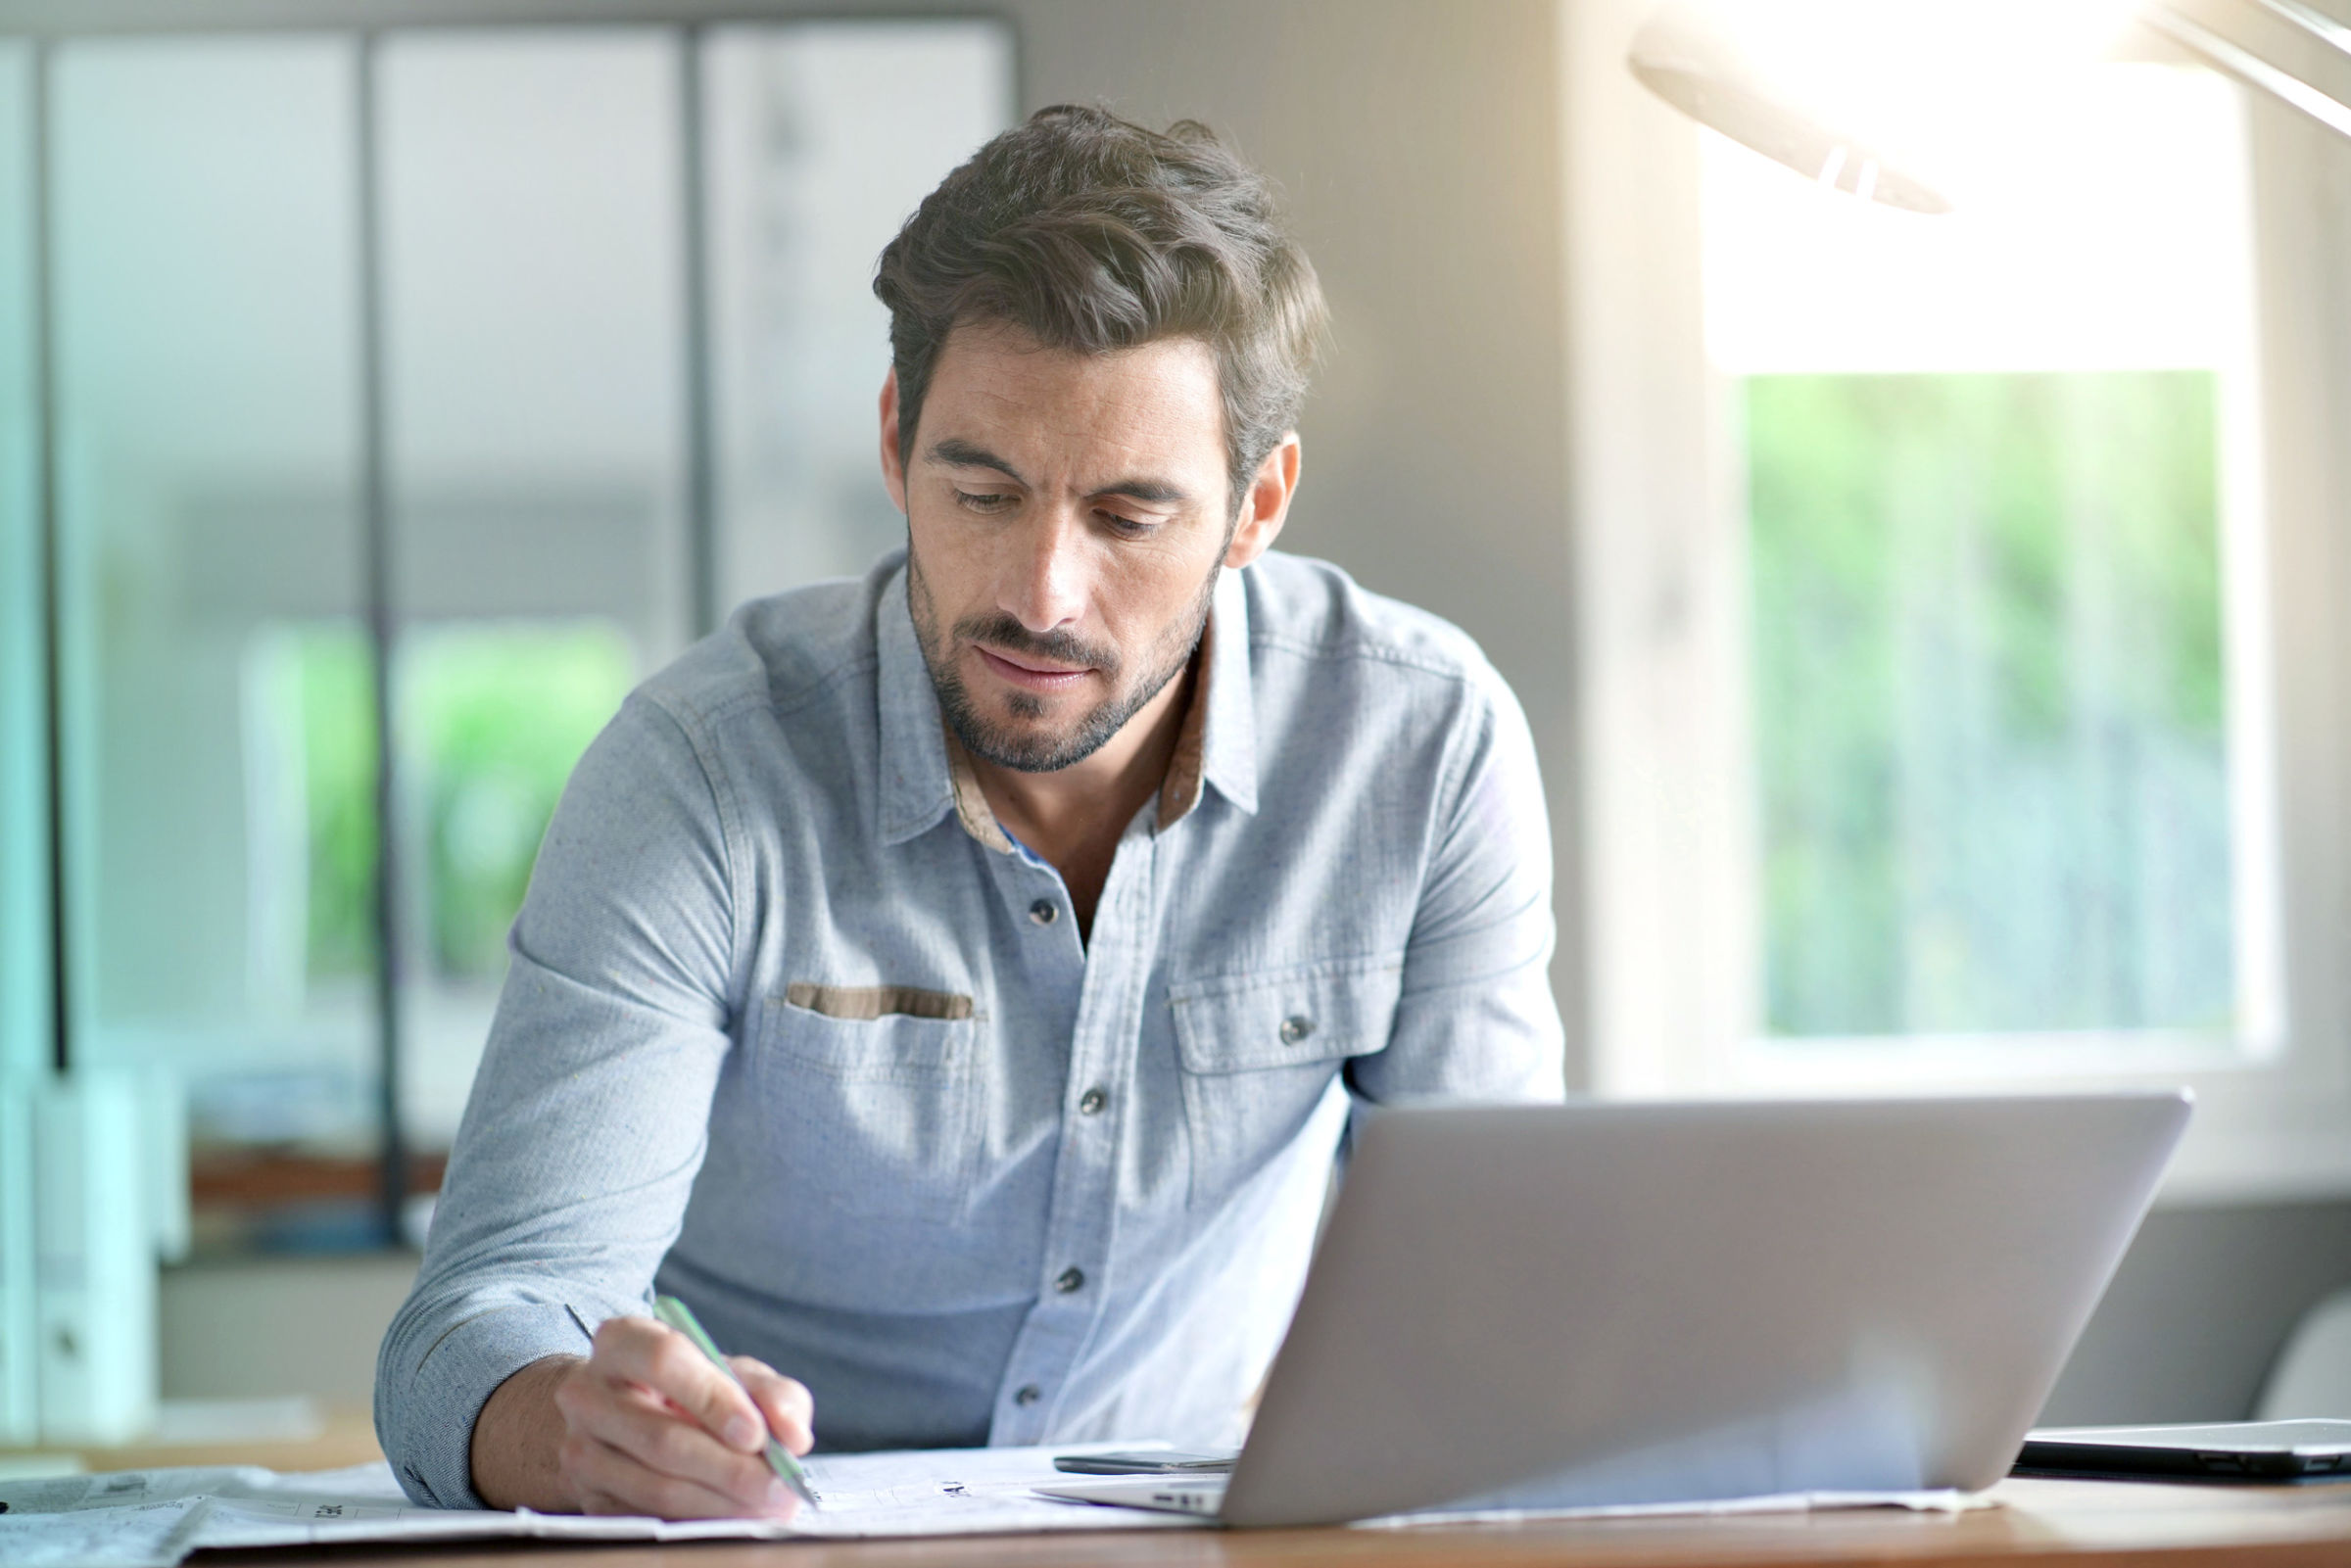 Opening een beleggingsrekening via LYNX en volg de optiewebinars & live trading sessies